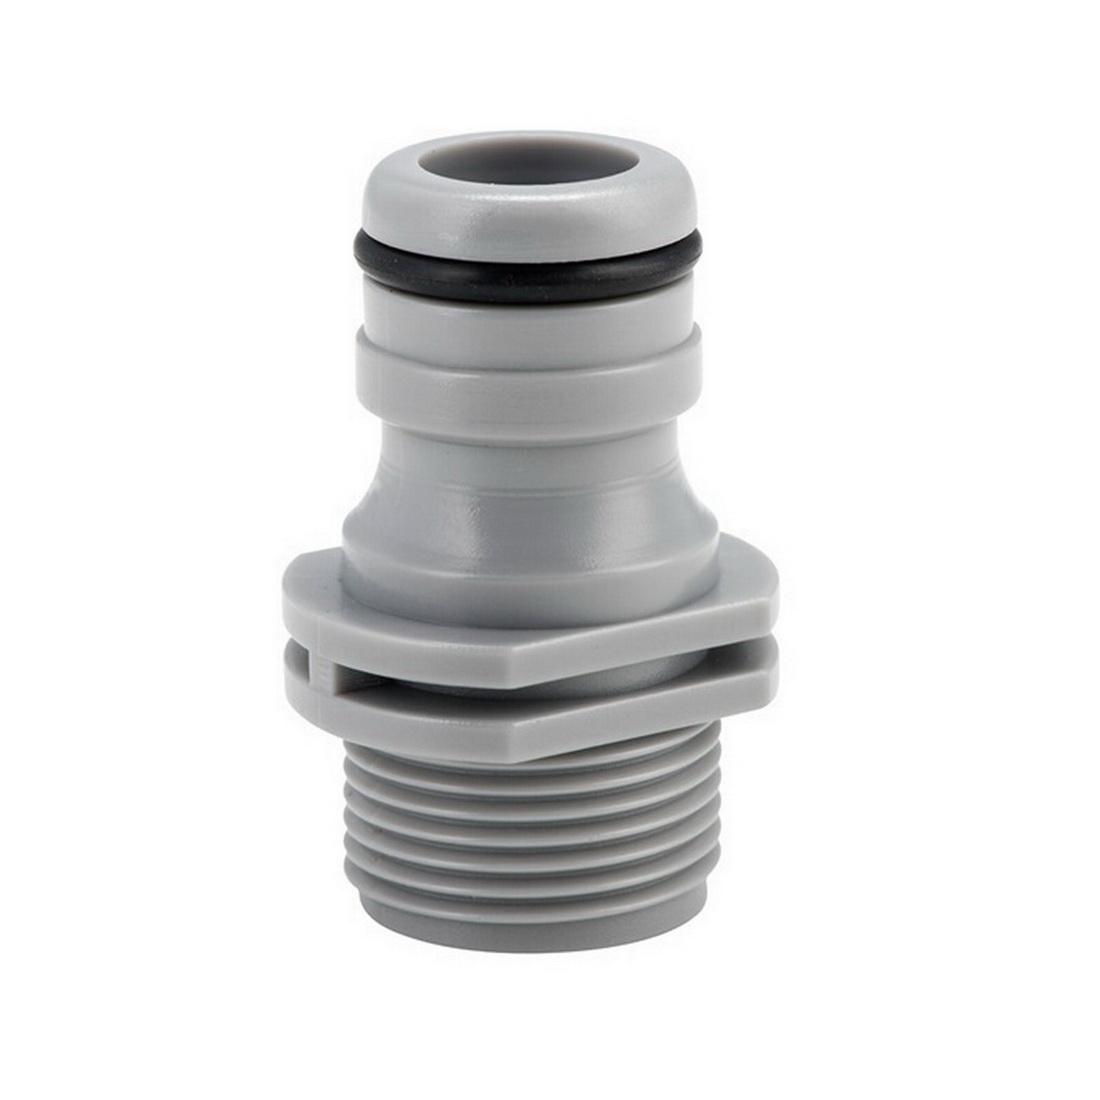 Sprinkler Adaptor 18mm x 20mm